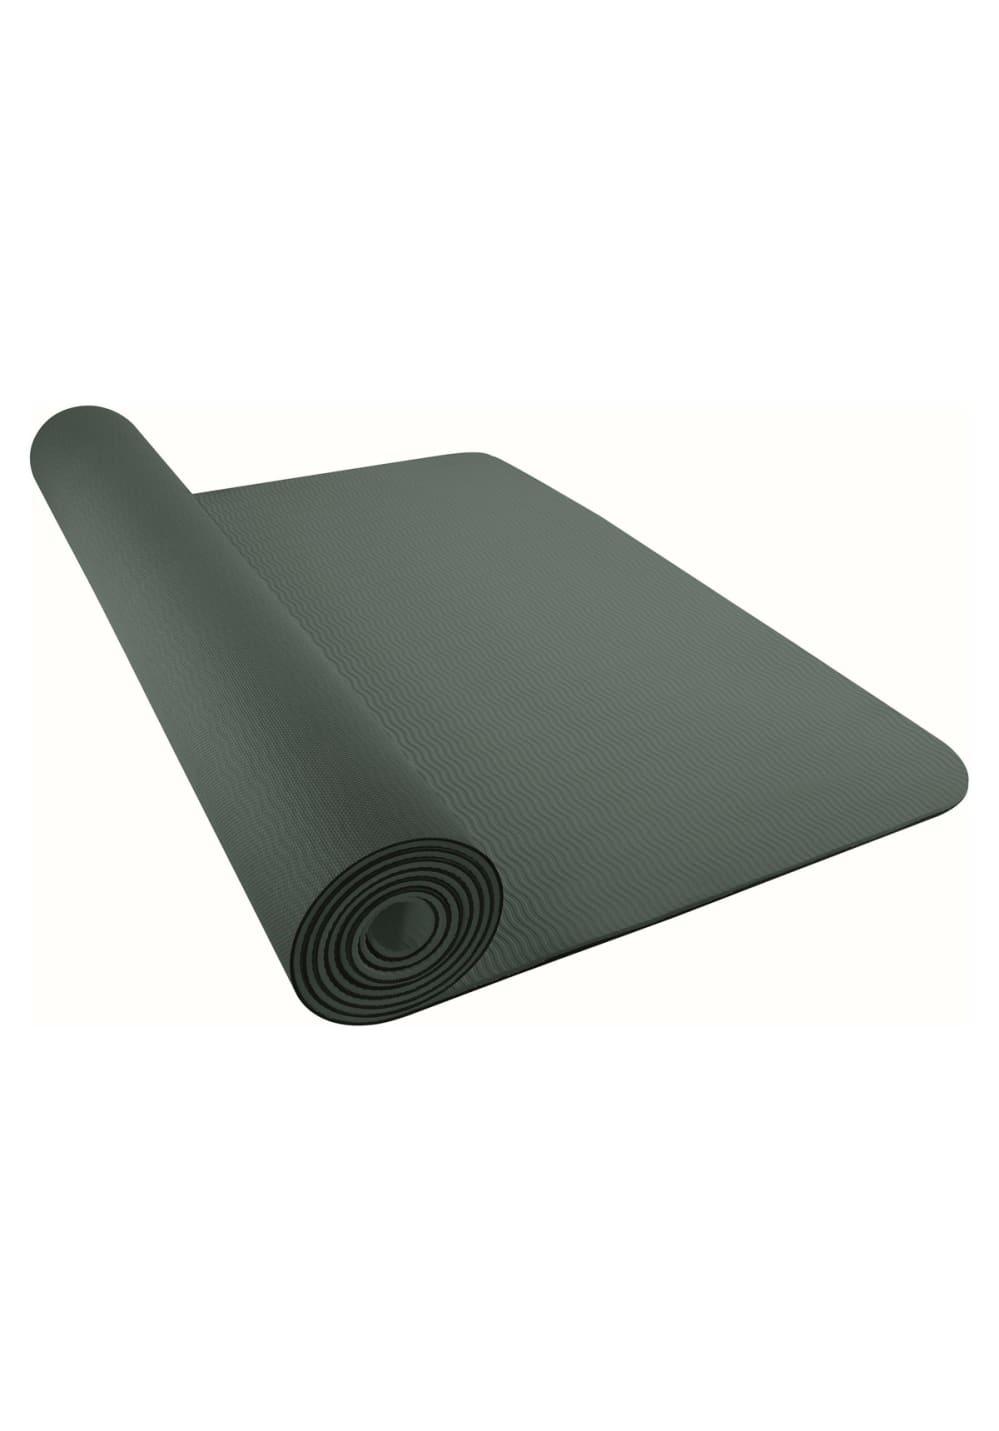 sports shoes 52778 850dc Fundamental Yoga Mat 3mm - Fitness accessories